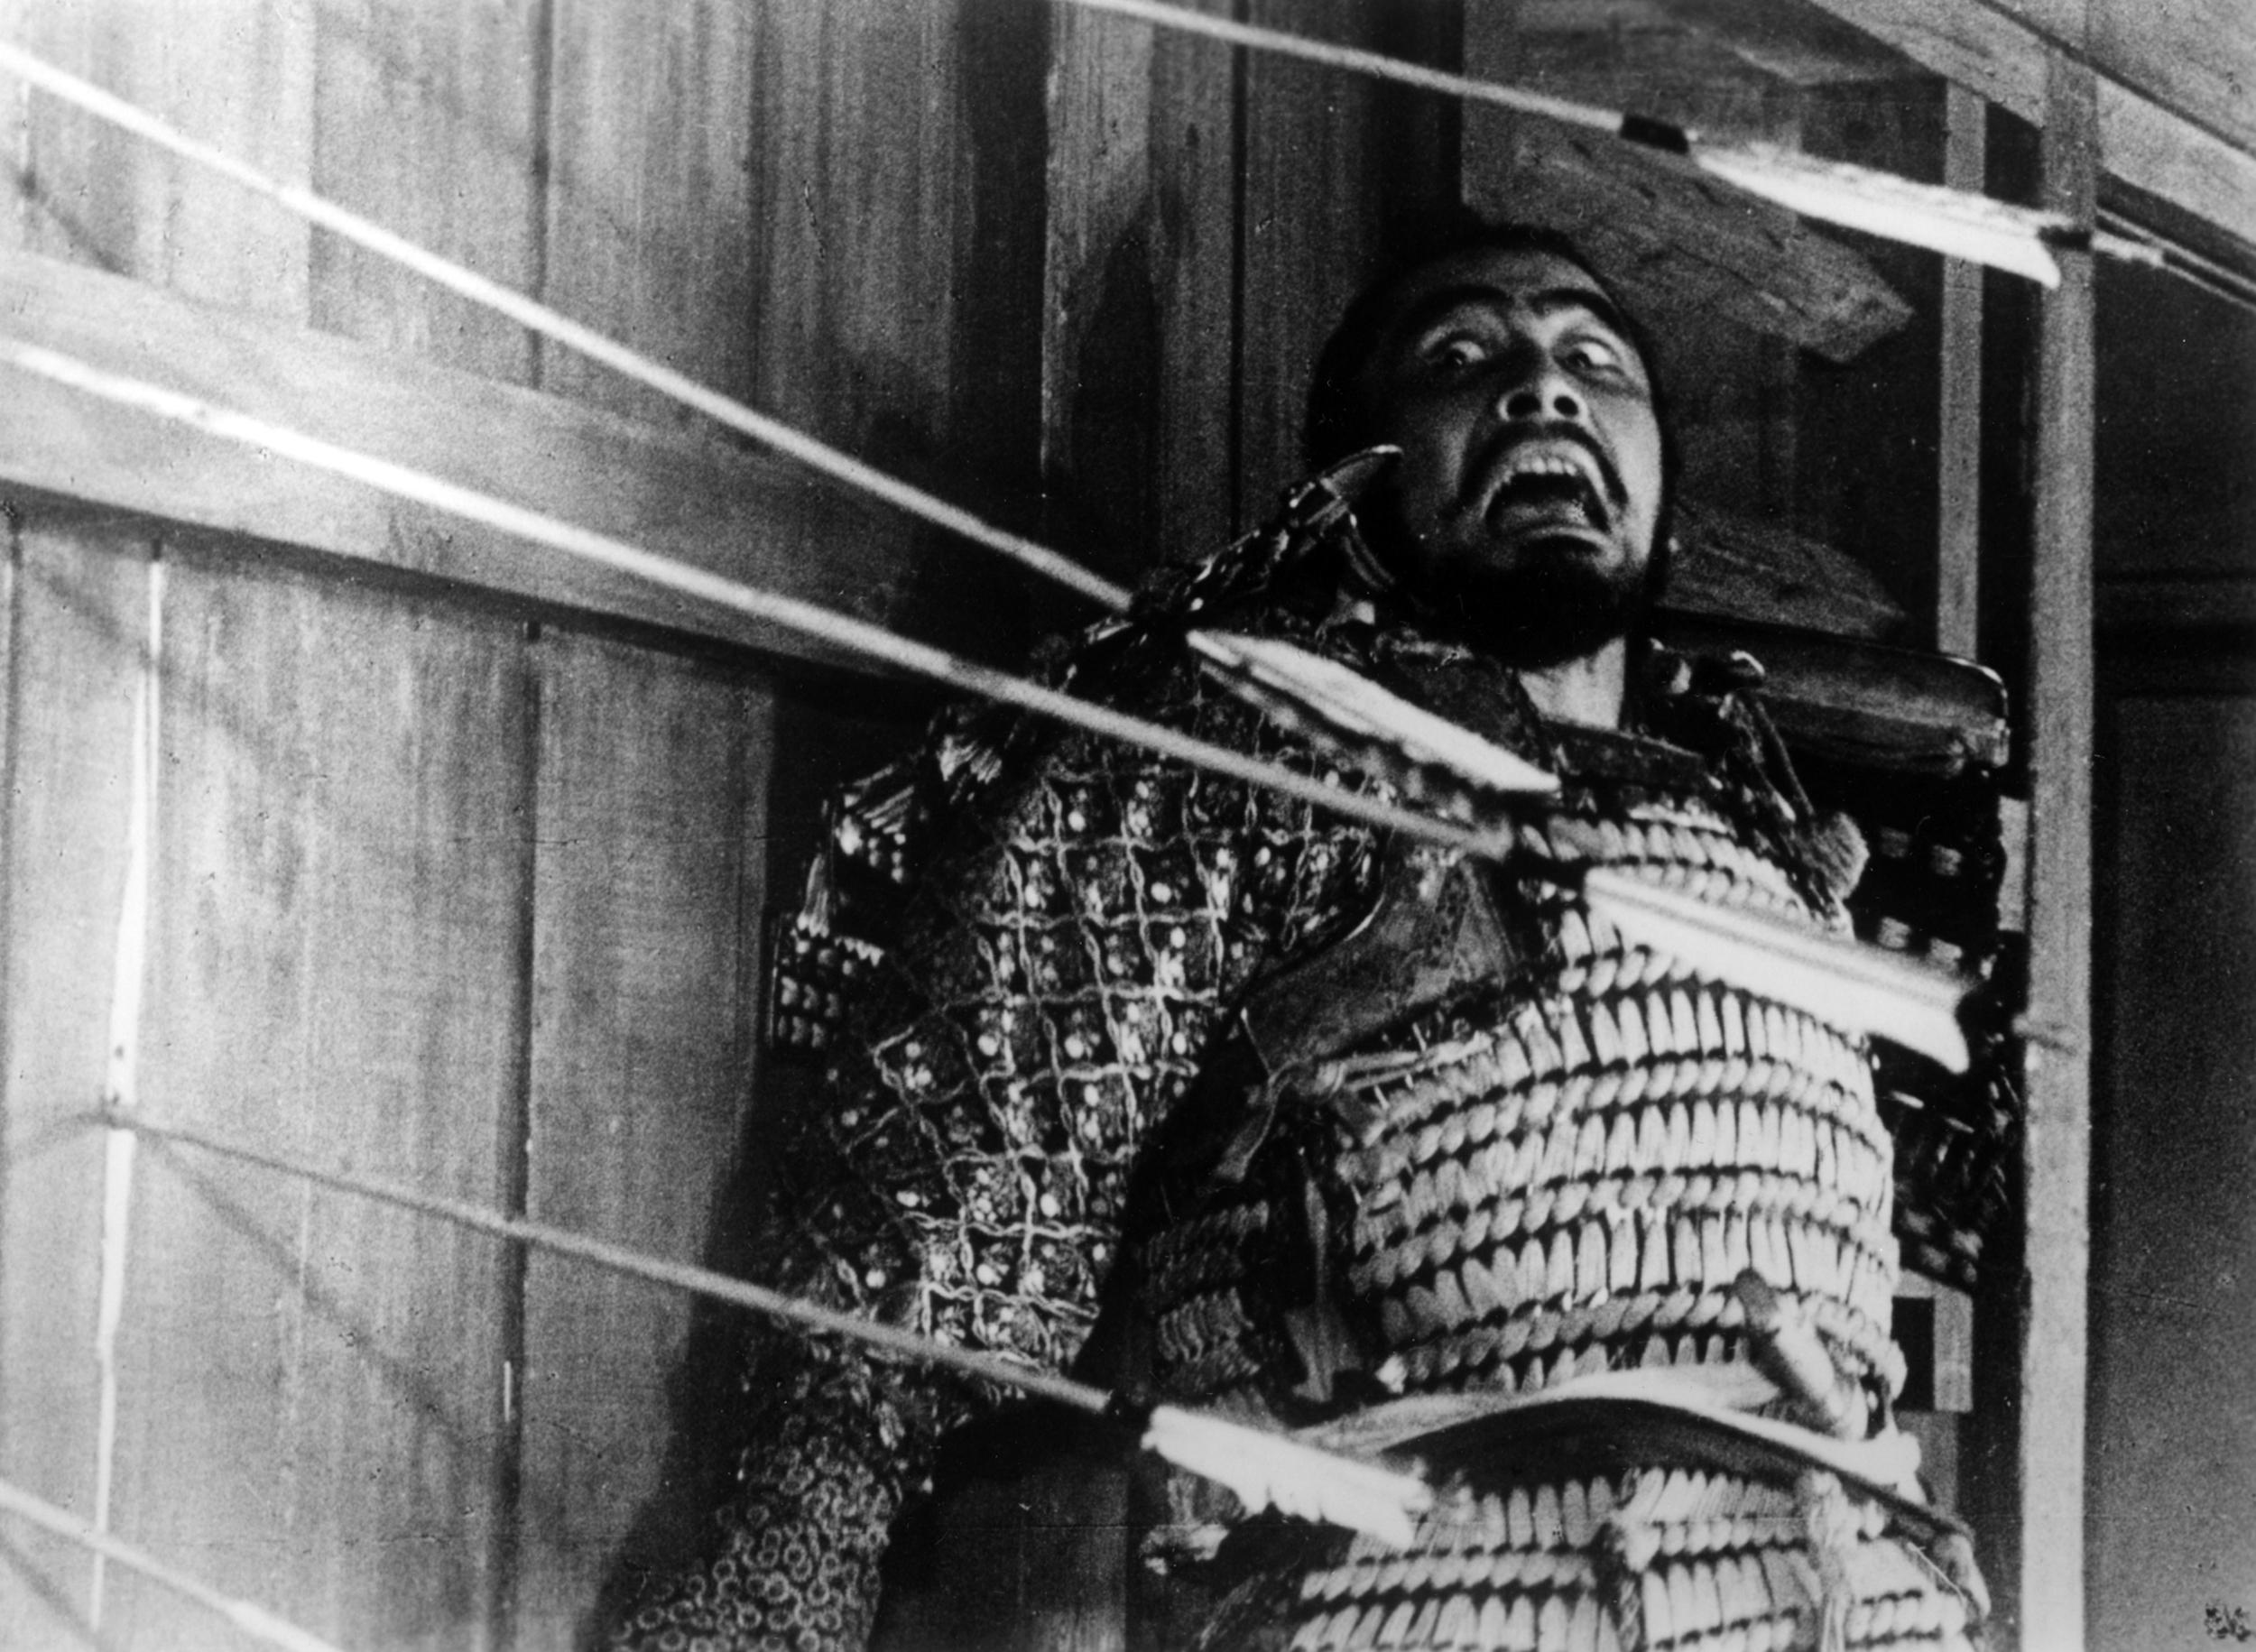 Film still from Kurosawa's  Throne of Blood